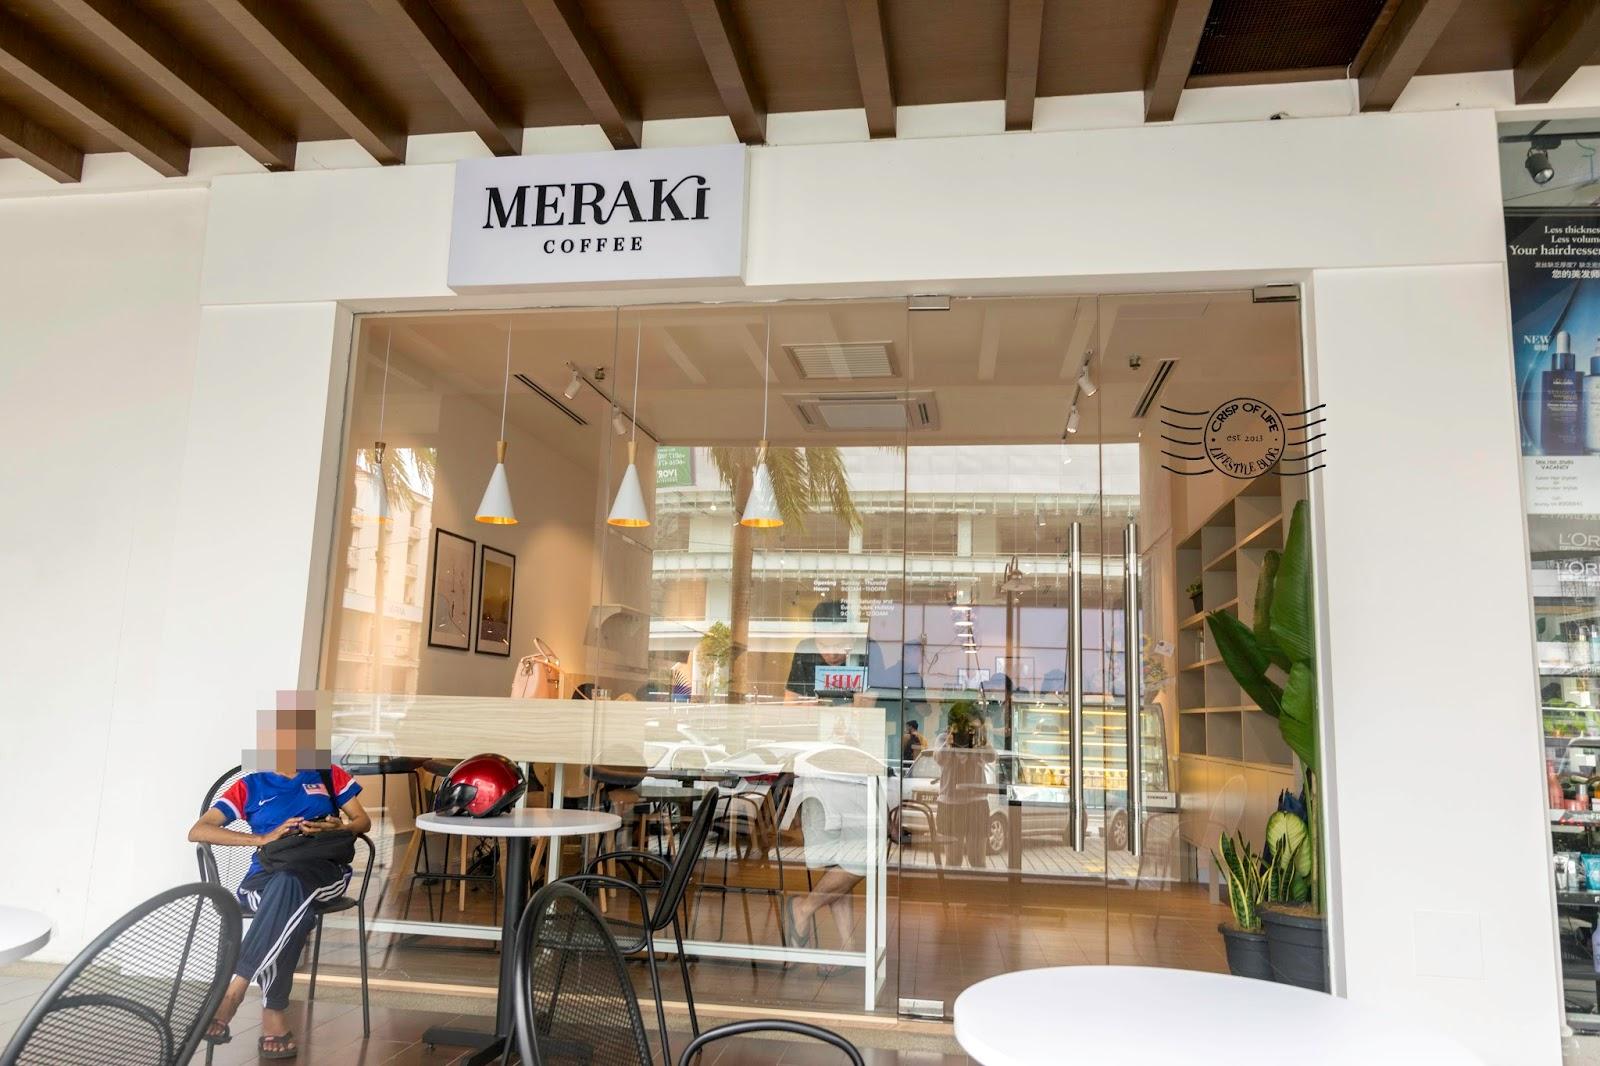 Meraki Coffee Island Plaza